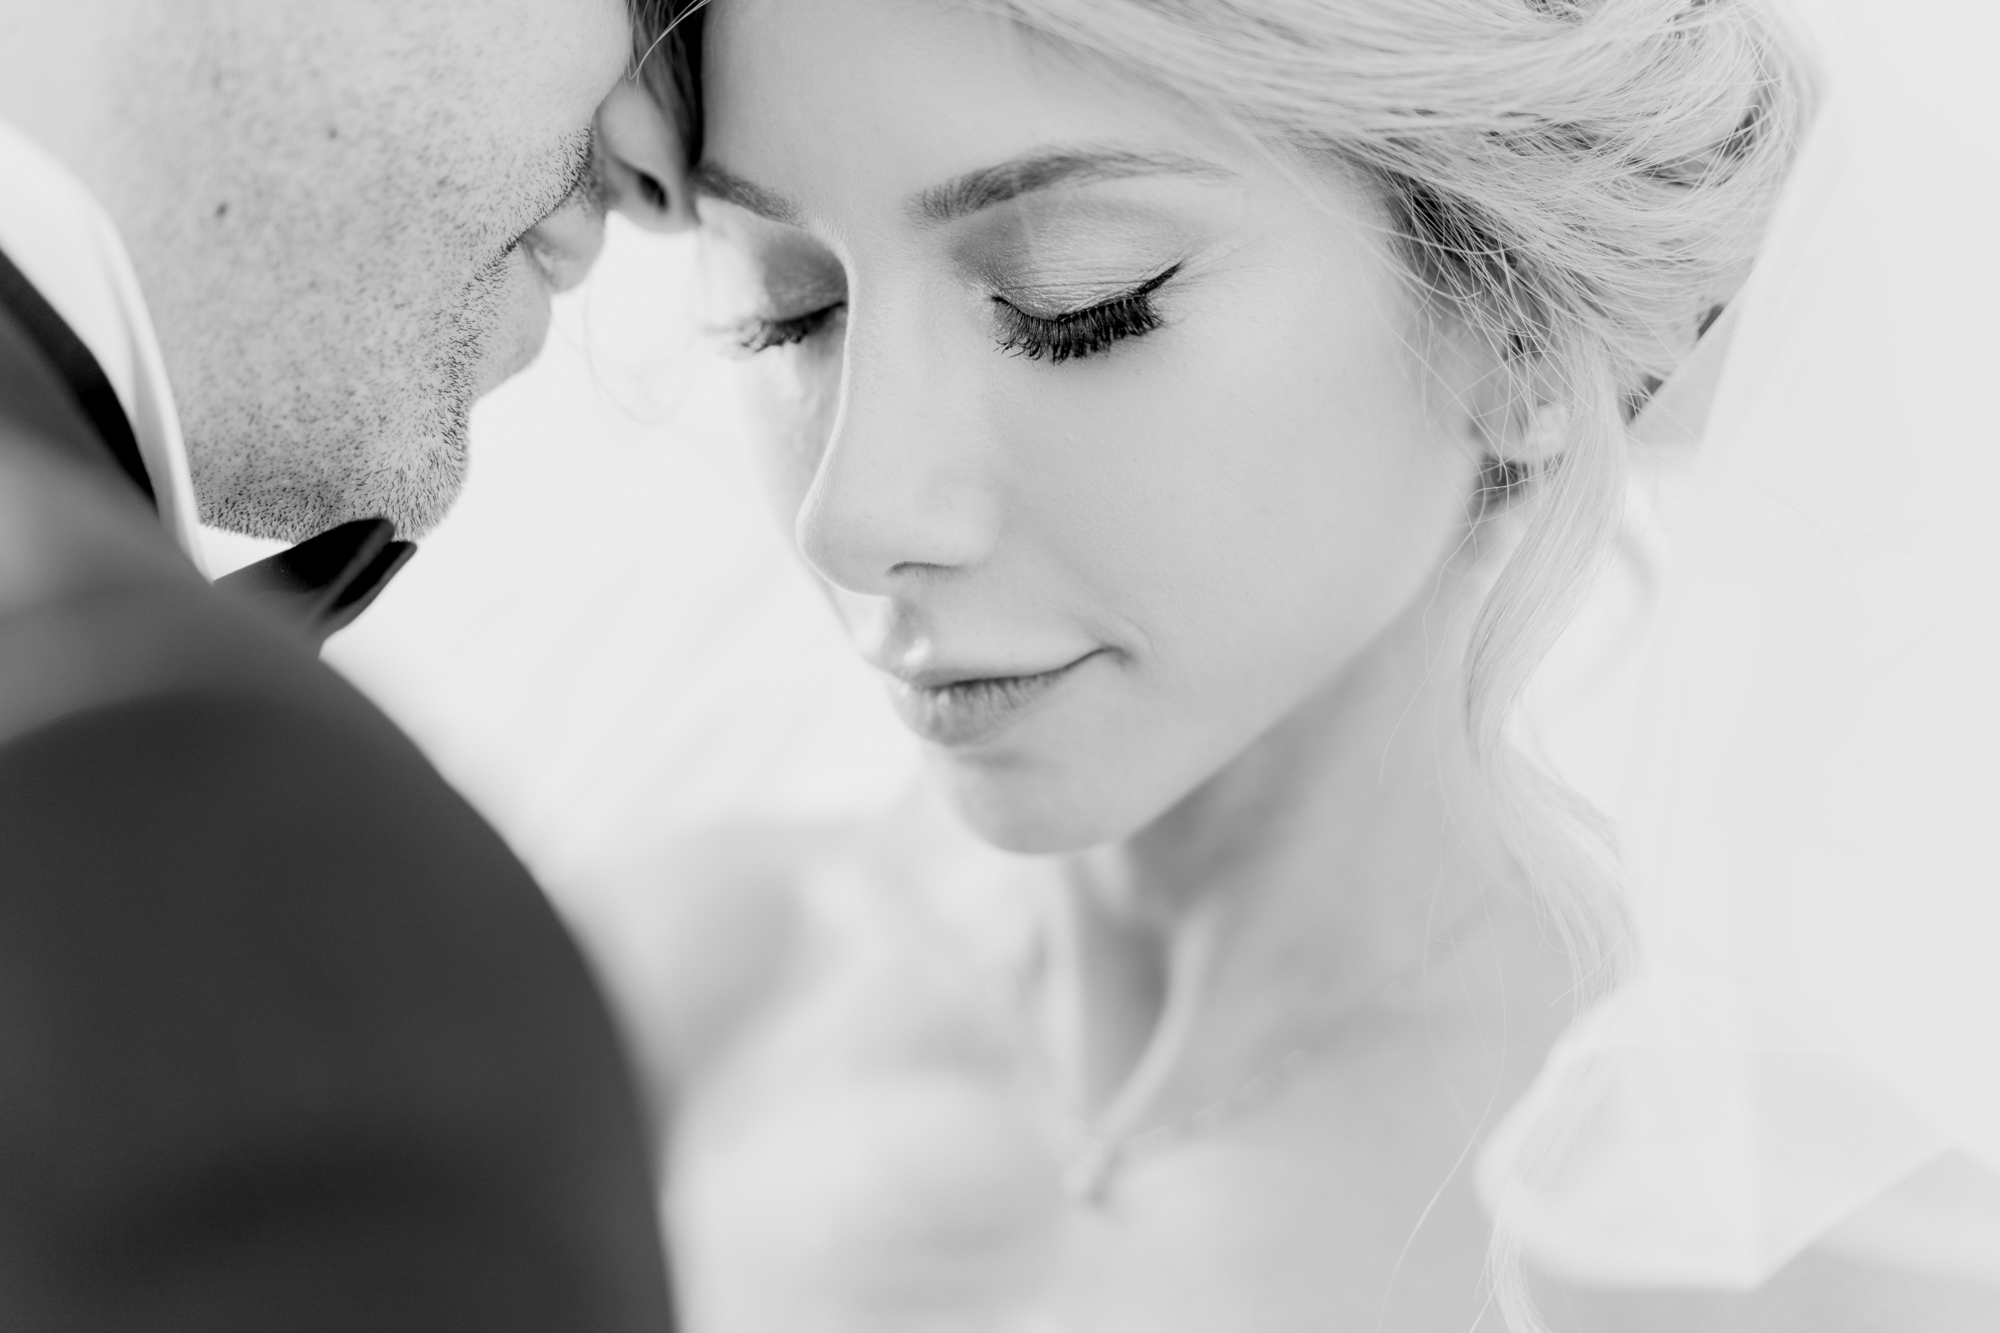 Romantic couple in portrait, black and white photography photo by David Bastianoni, Italy wedding photographers